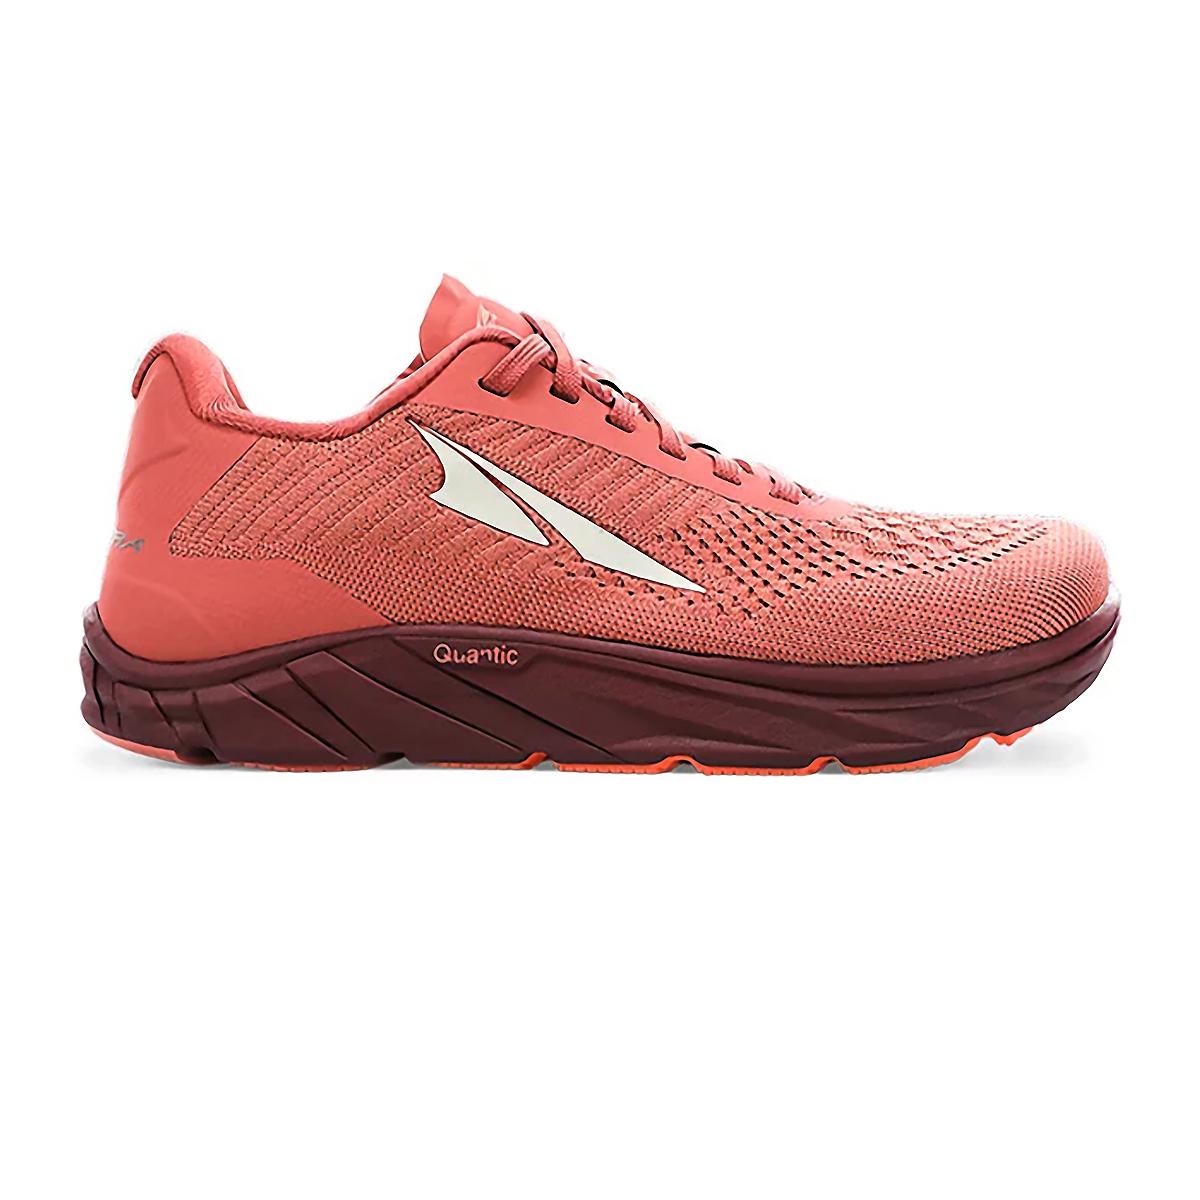 Women's Altra Torin 4.5 Plush Running Shoe - Color: Misty Rose - Size: 5.5 - Width: Regular, Misty Rose, large, image 1